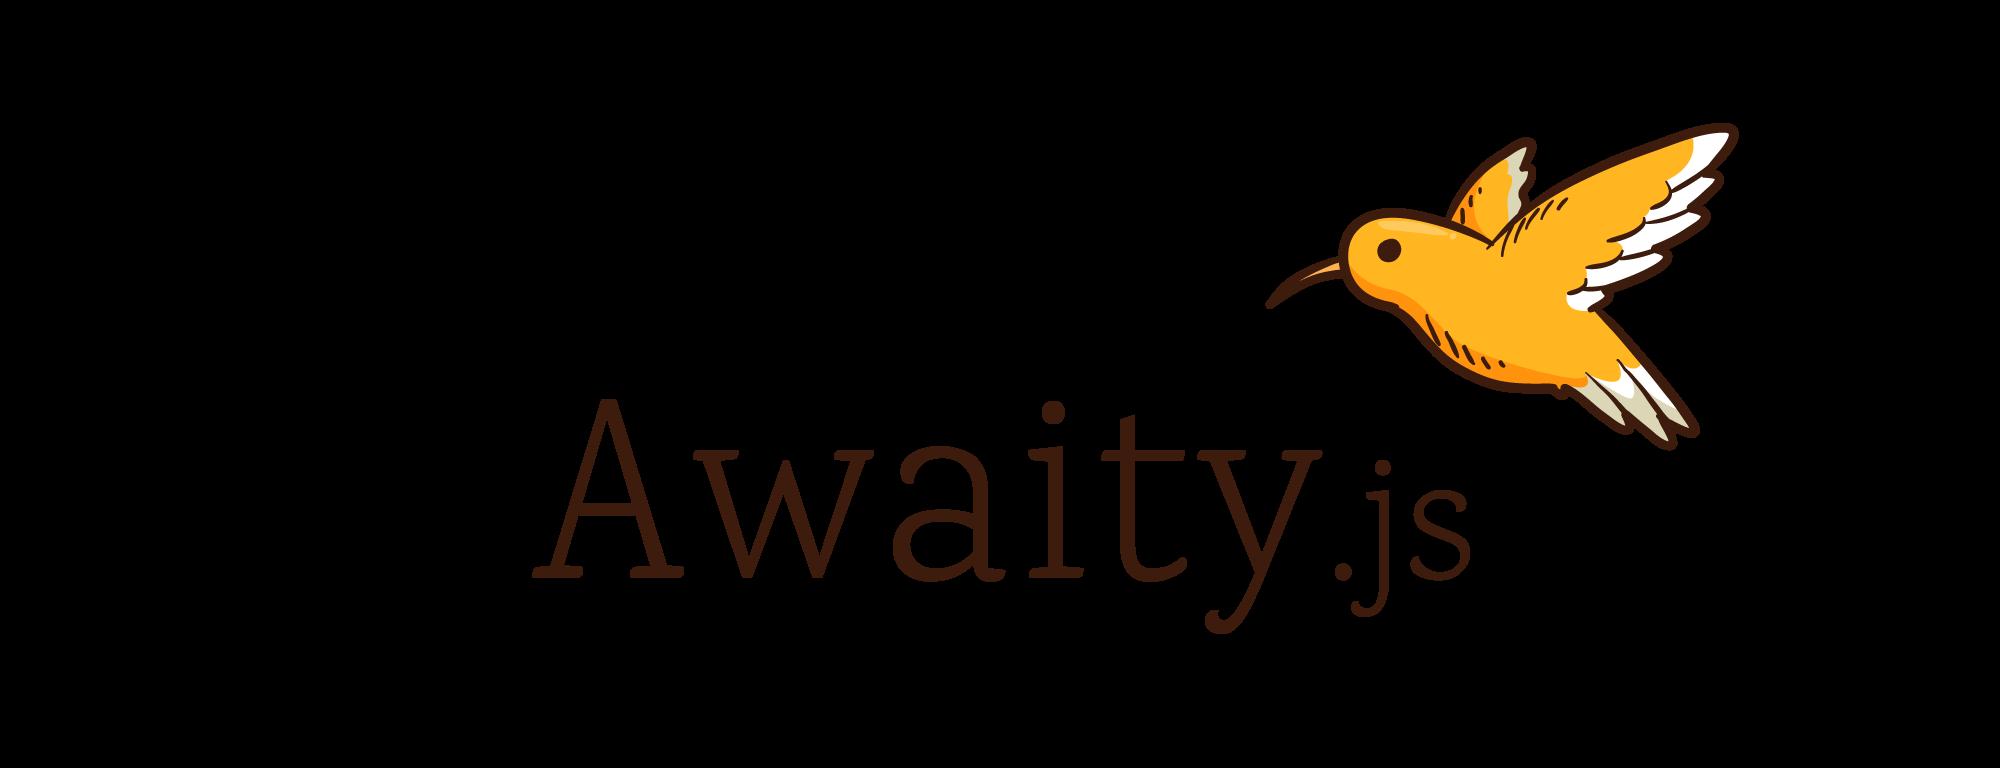 Awaity.js